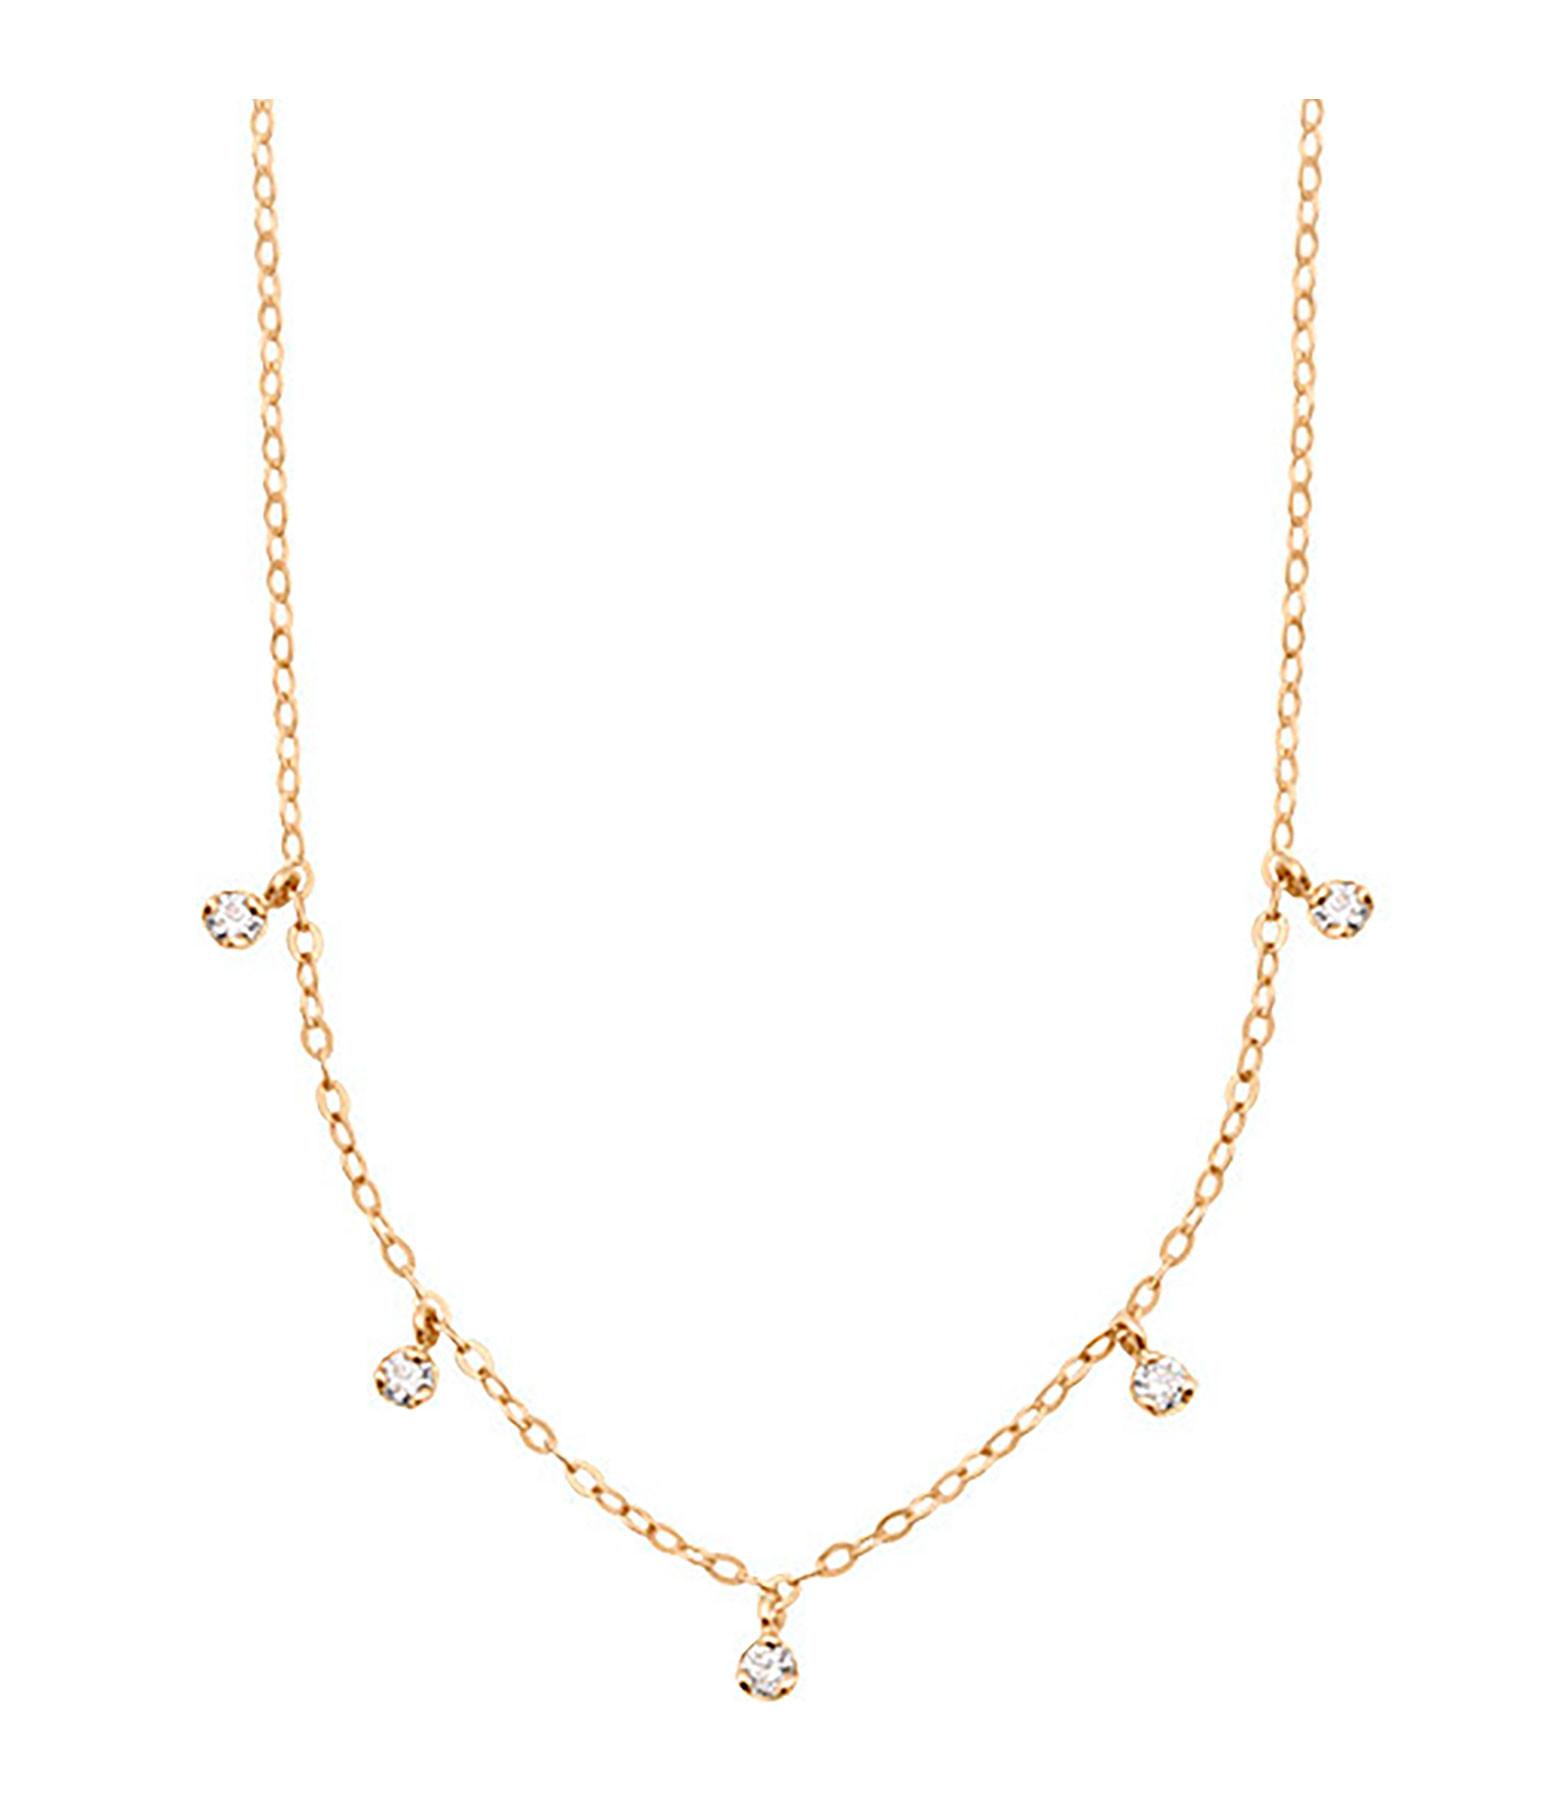 GIGI CLOZEAU - Collier Mini Gigi 5 Diamants